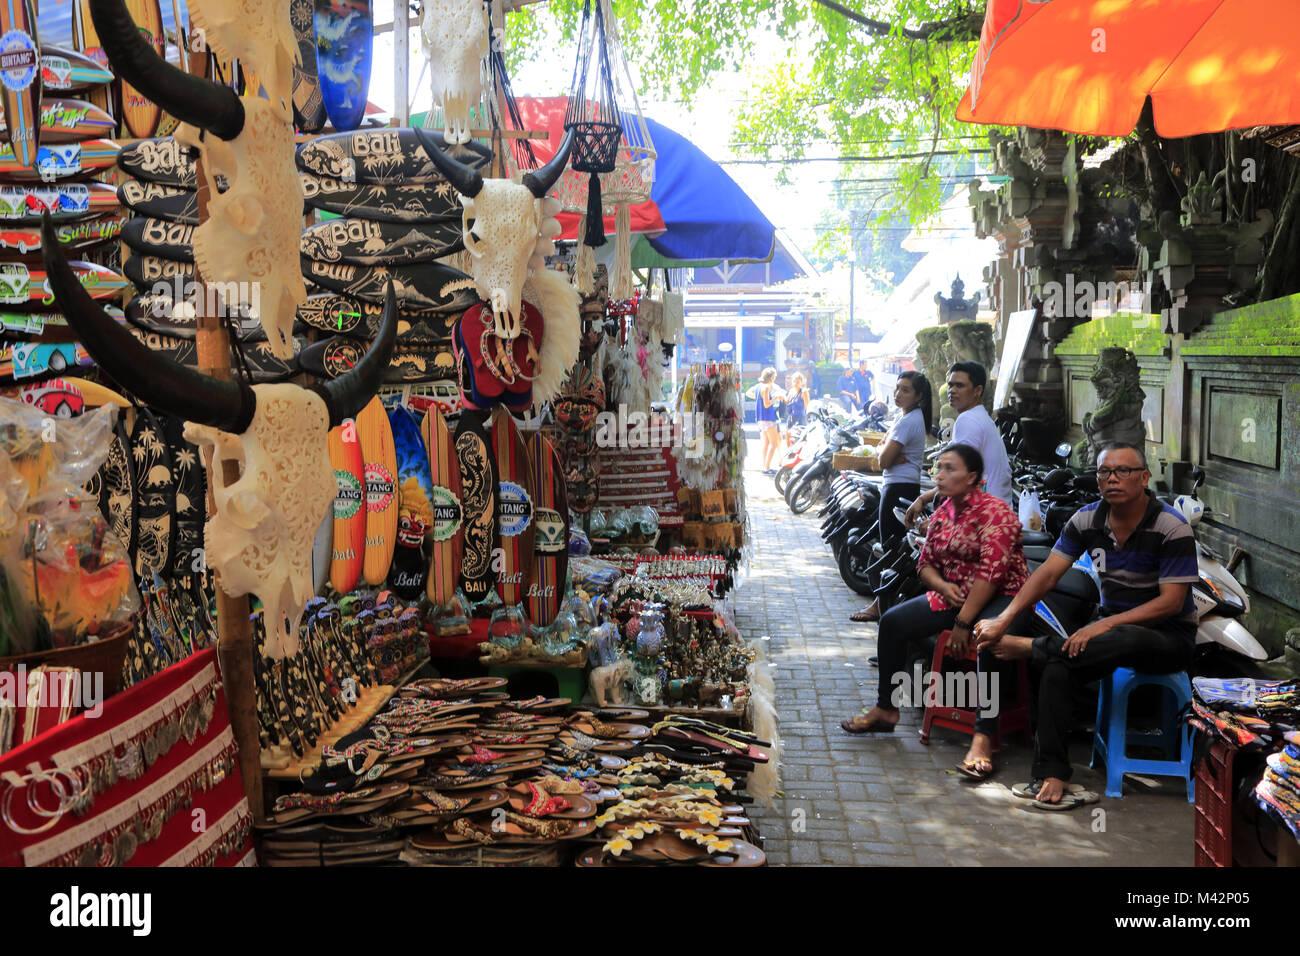 Ubud Art Market.Ubud.Bali.Indonesia - Stock Image